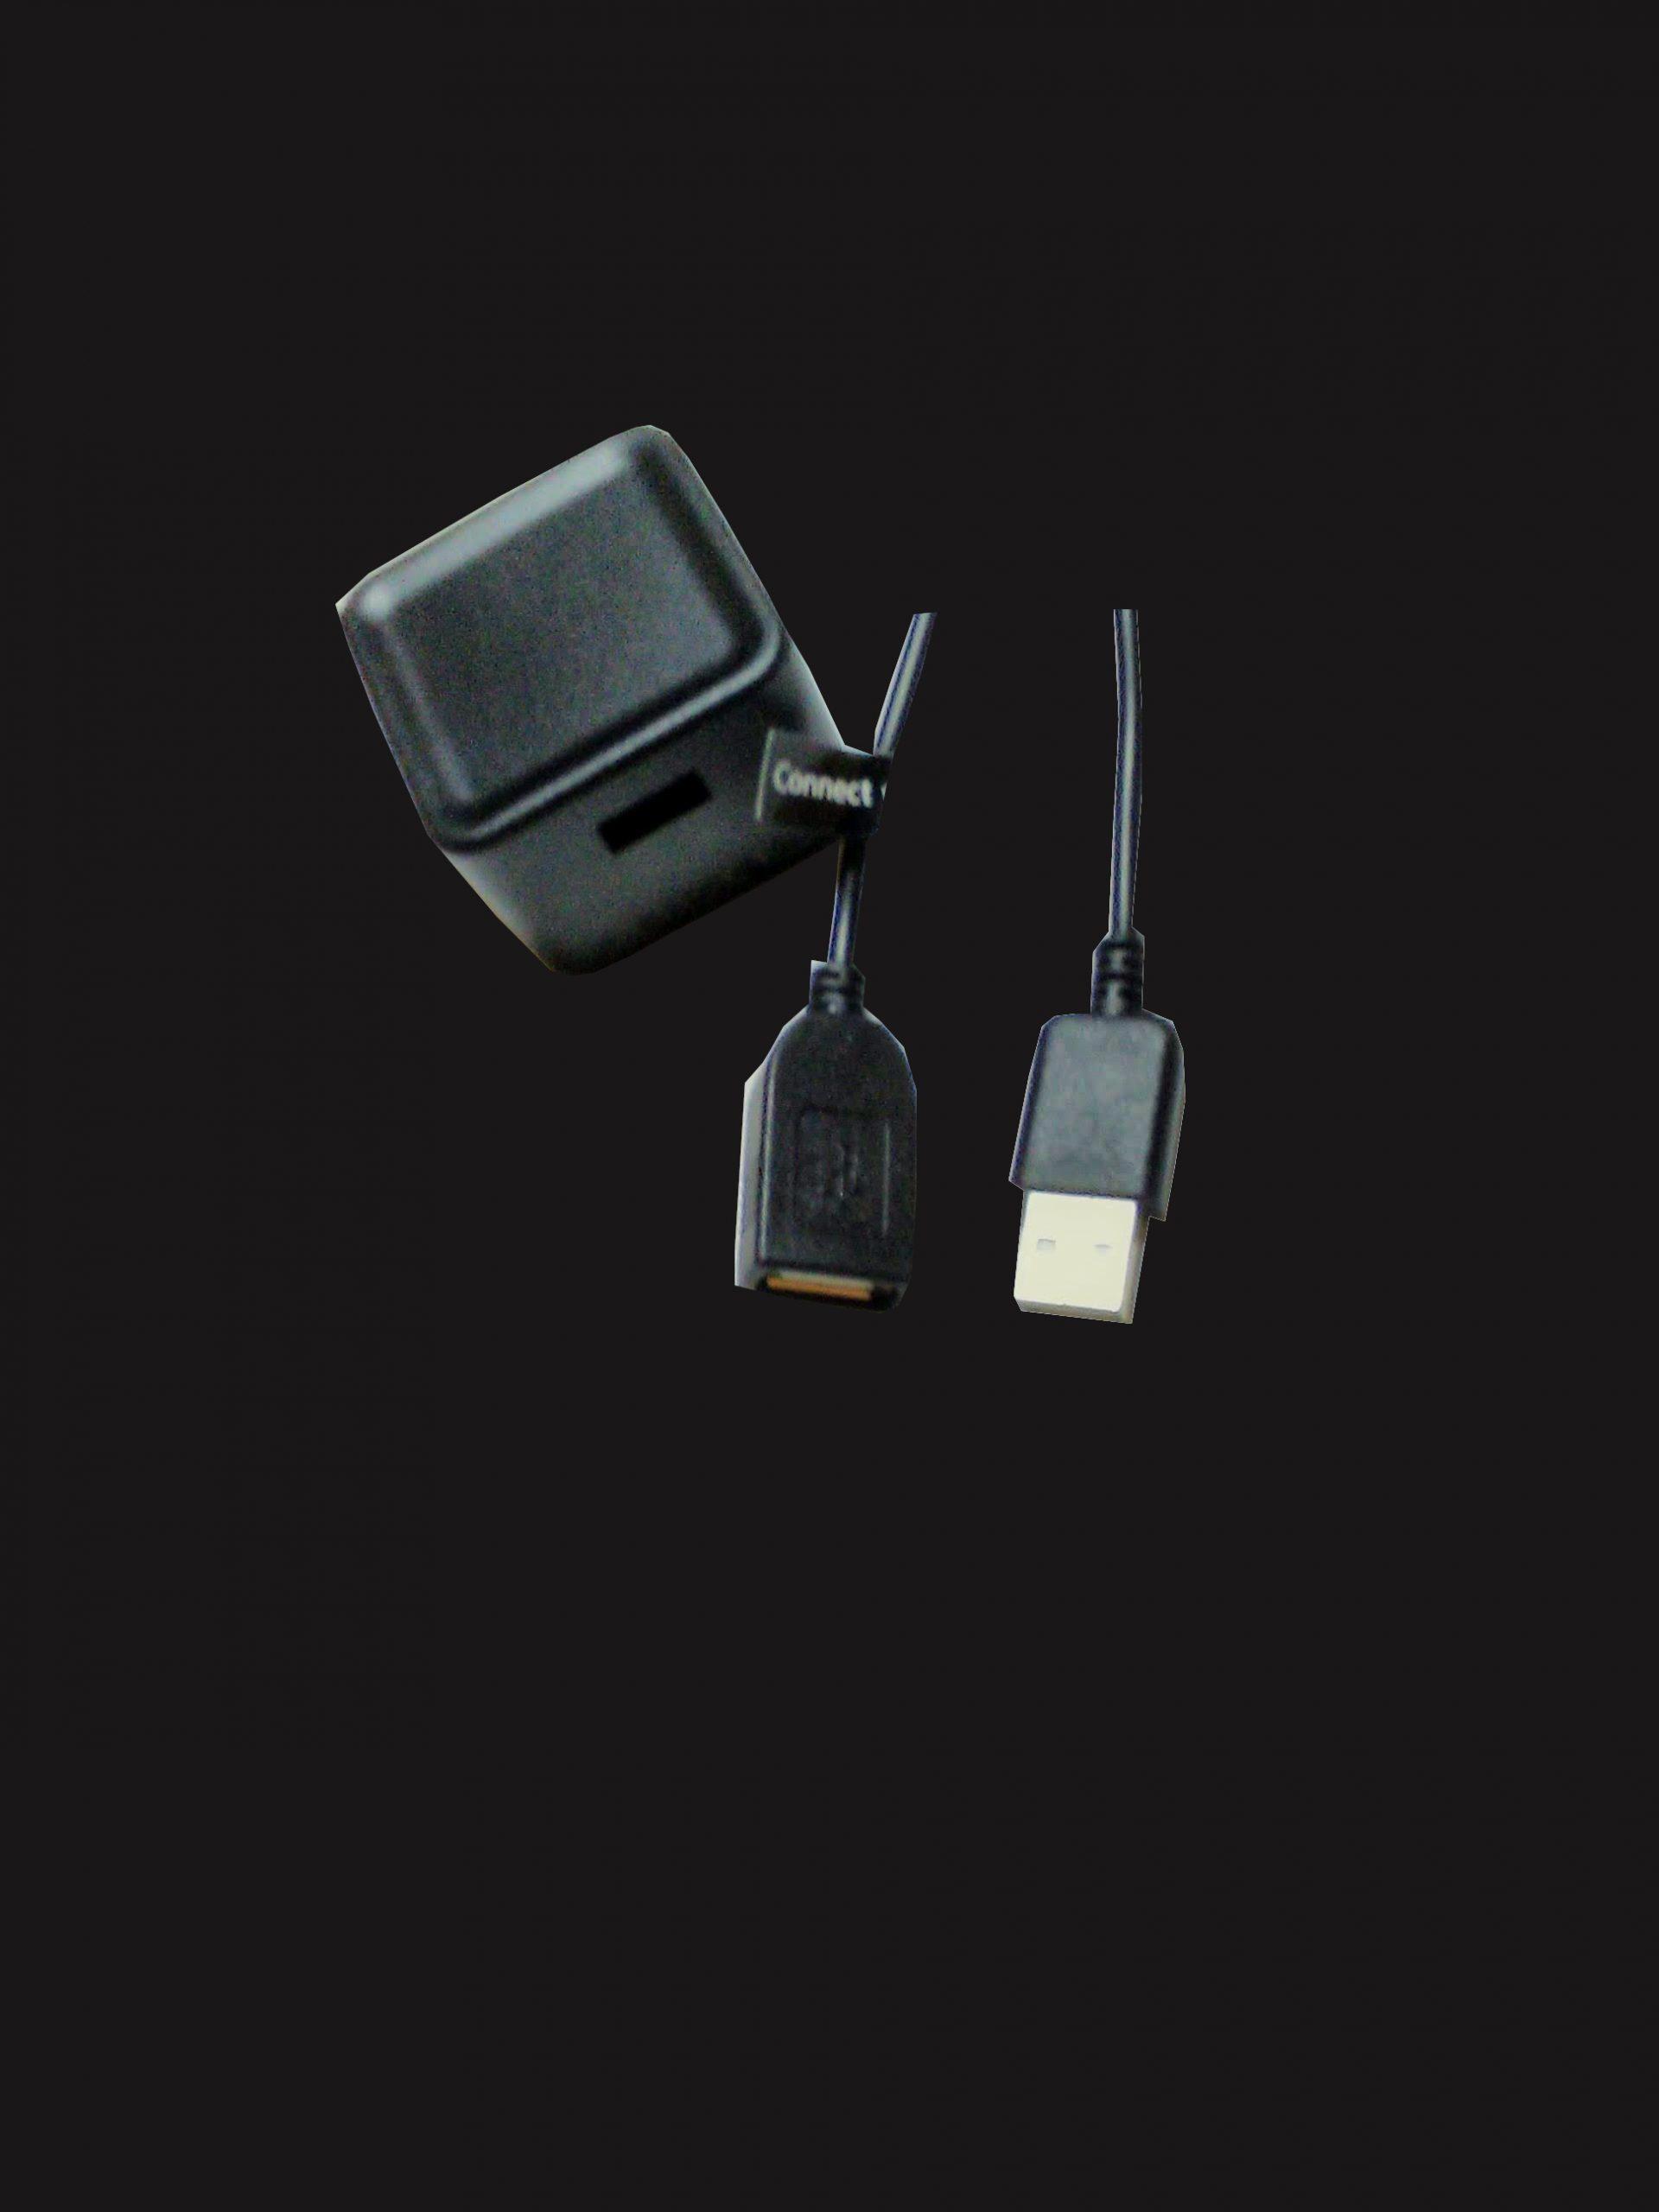 USB端子2用のACアダプタ